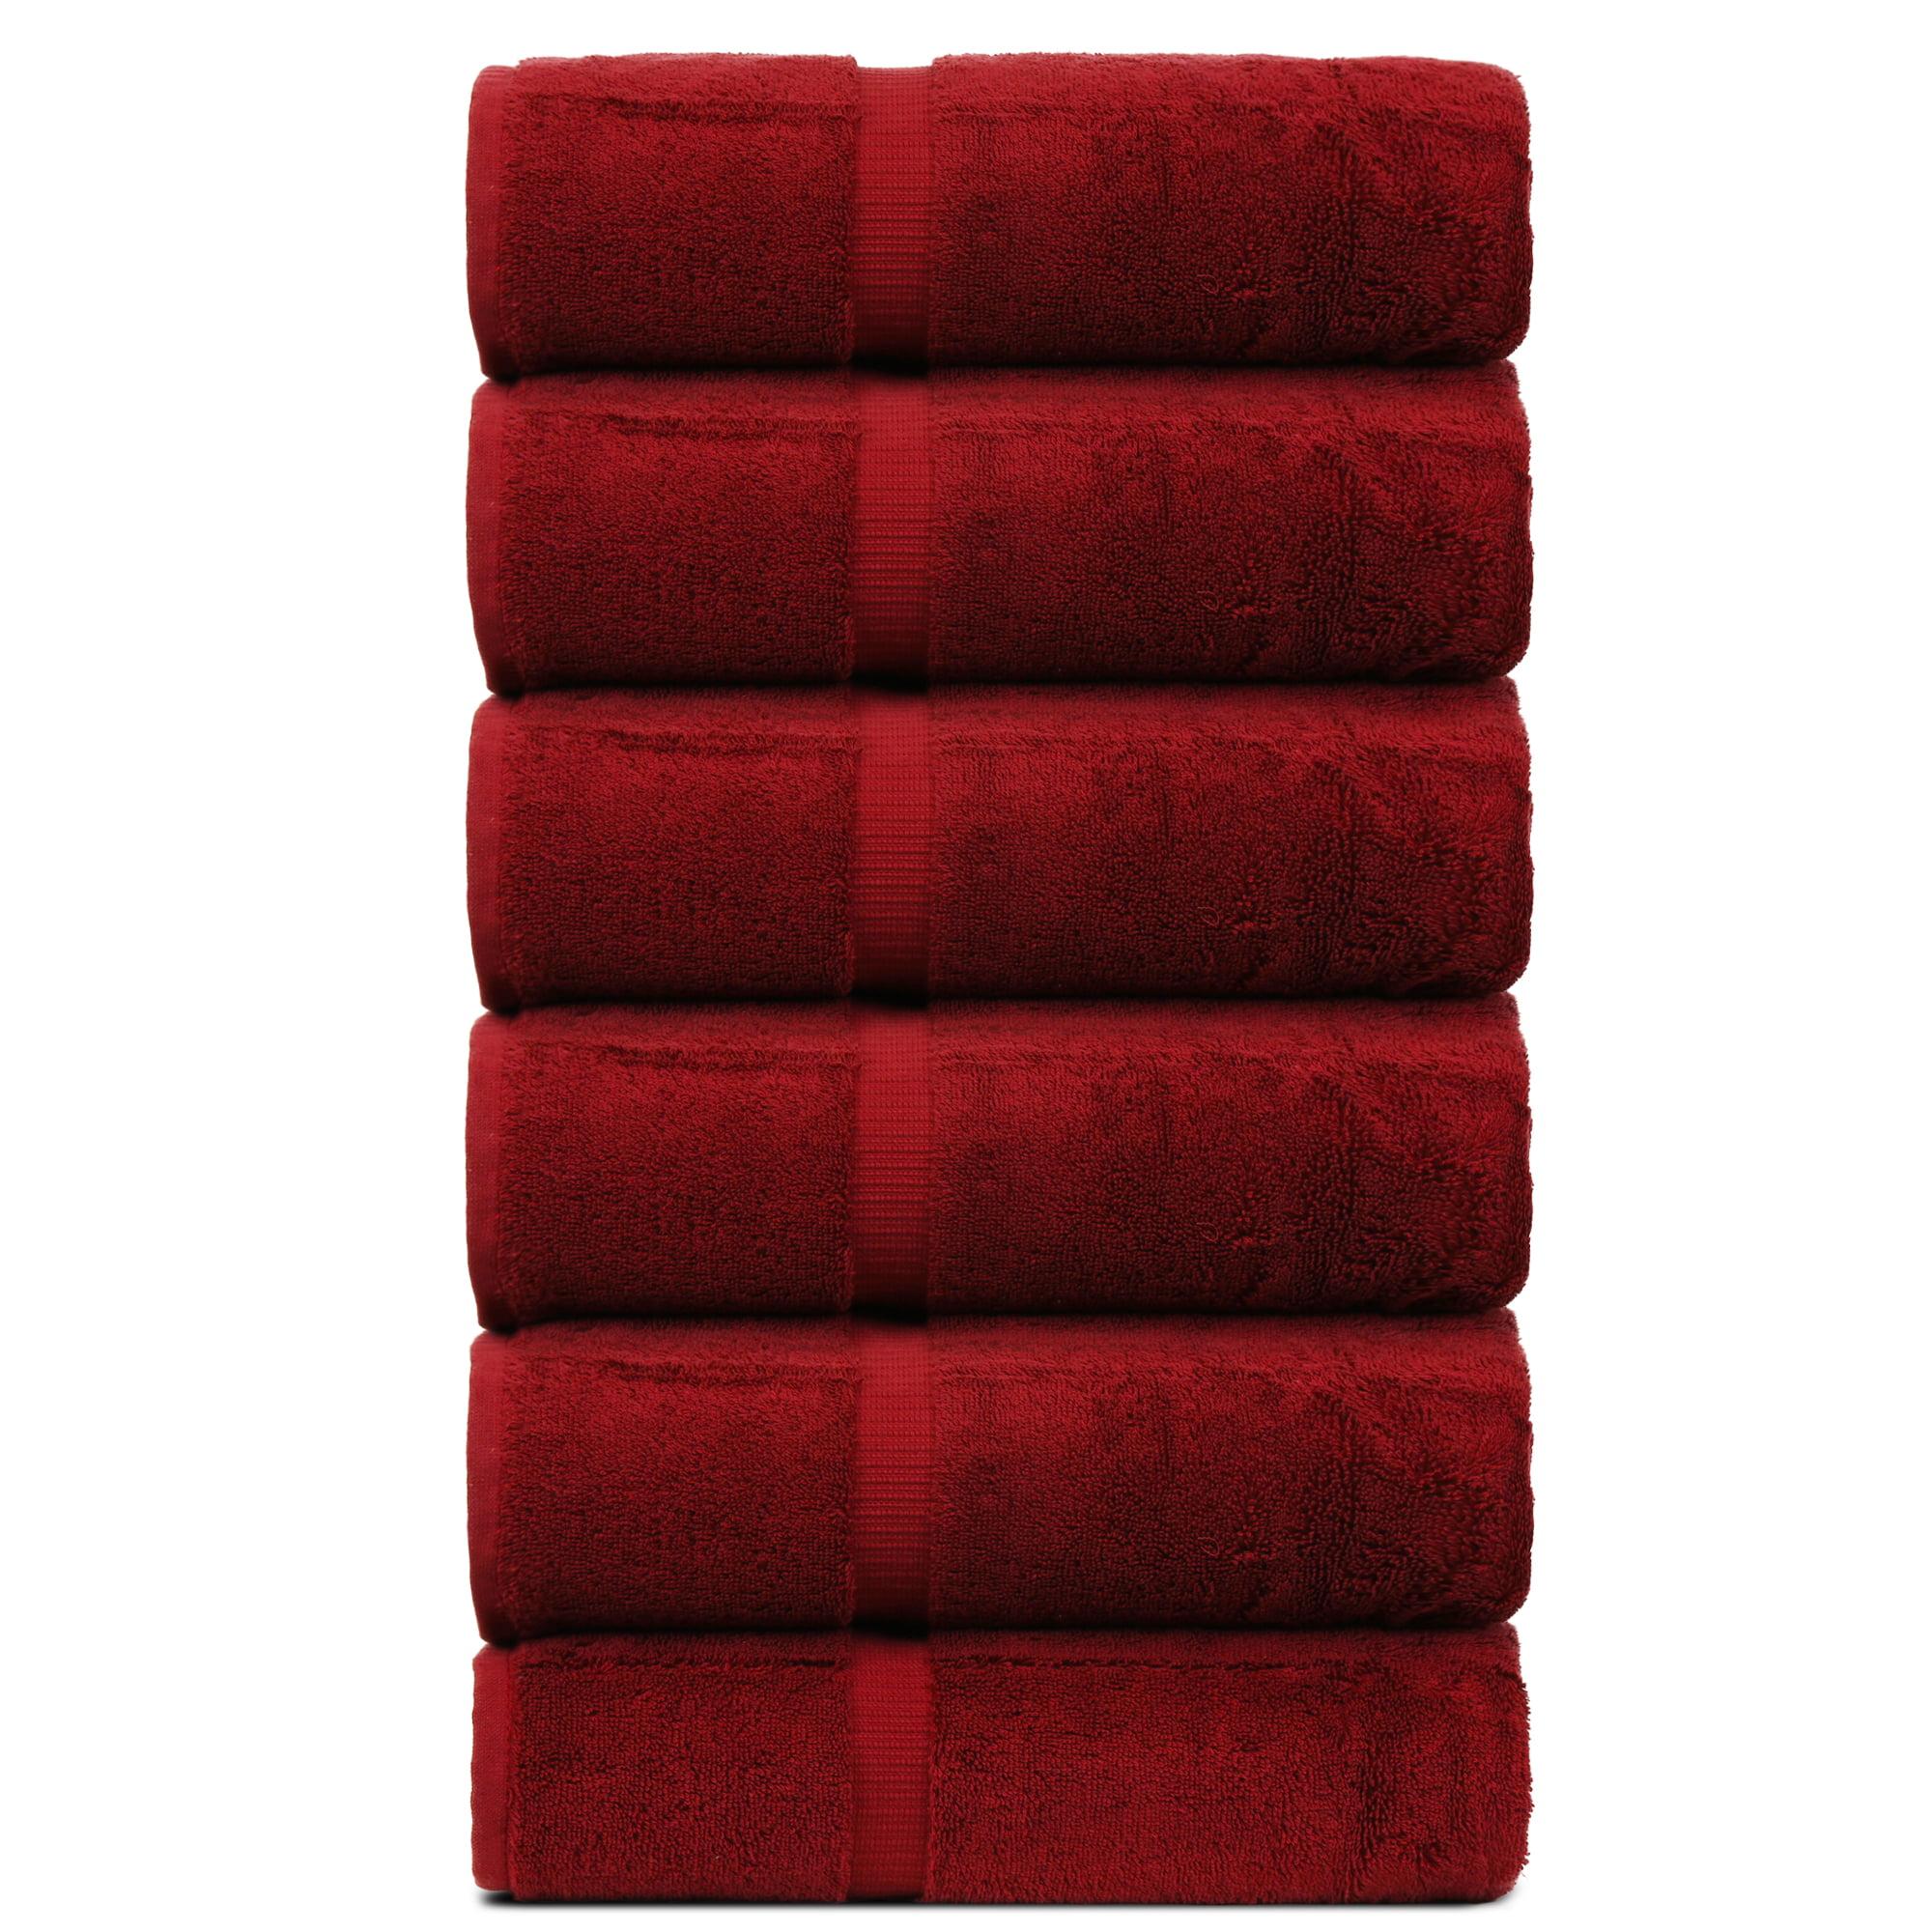 Luxury Hotel & Spa Towel Turkish Cotton Washcloths - Cranberry - Dobby Border - Set of 6